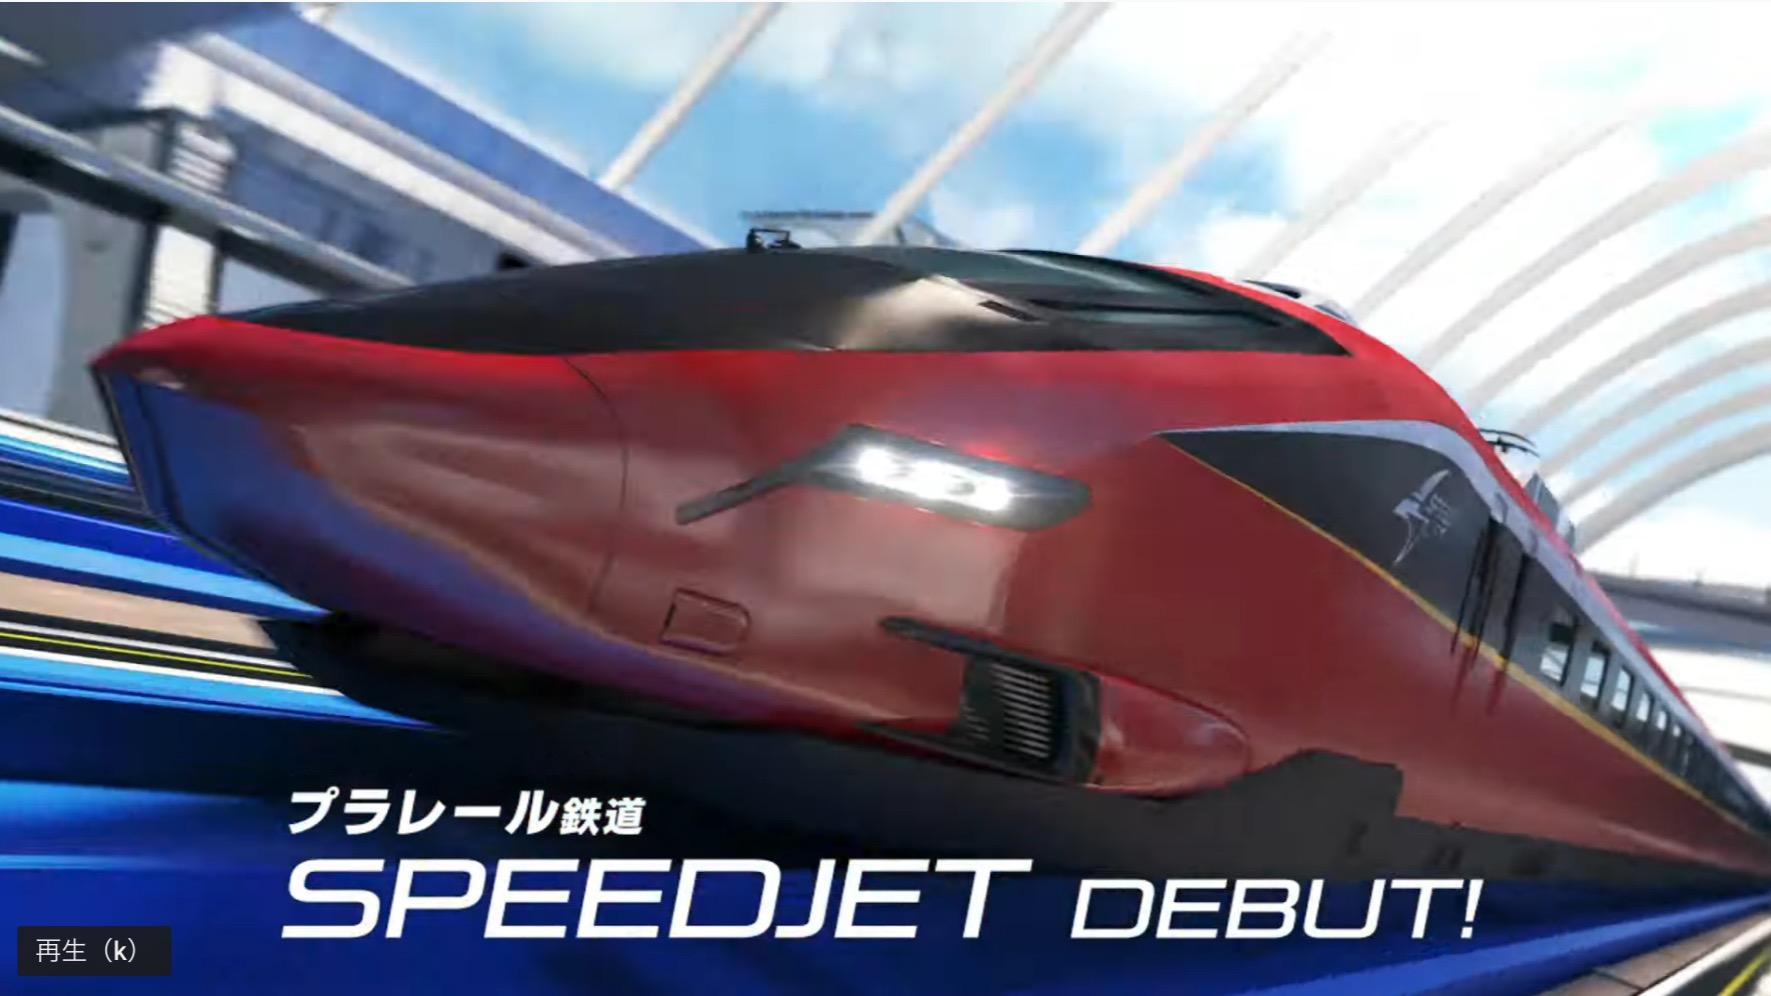 speedjet